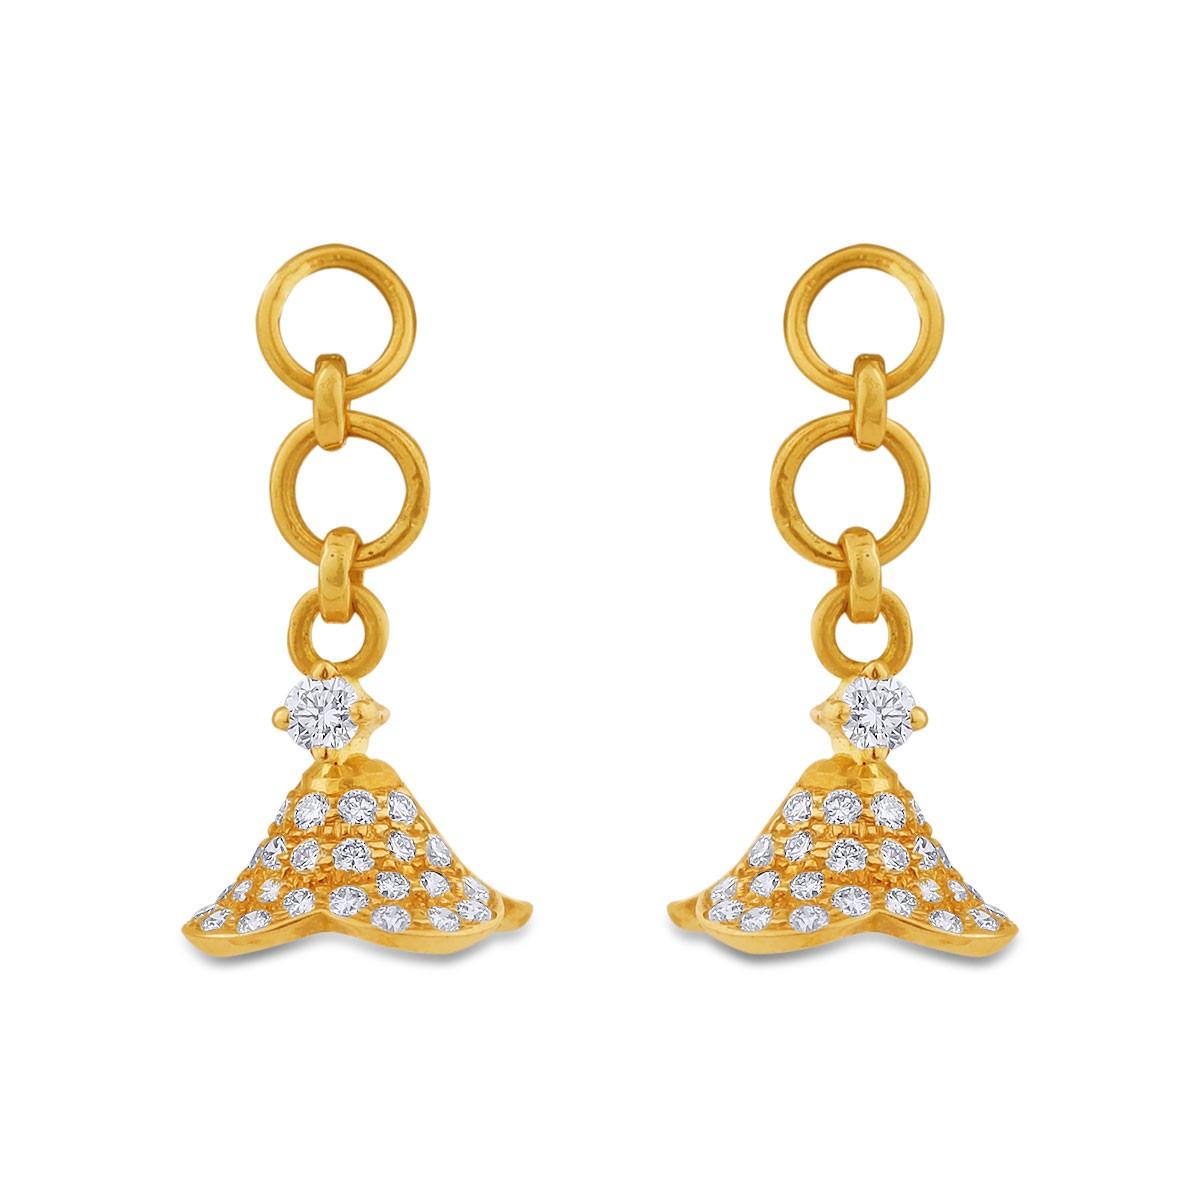 Sheila Girl's Yellow Gold Diamond Jhumkas